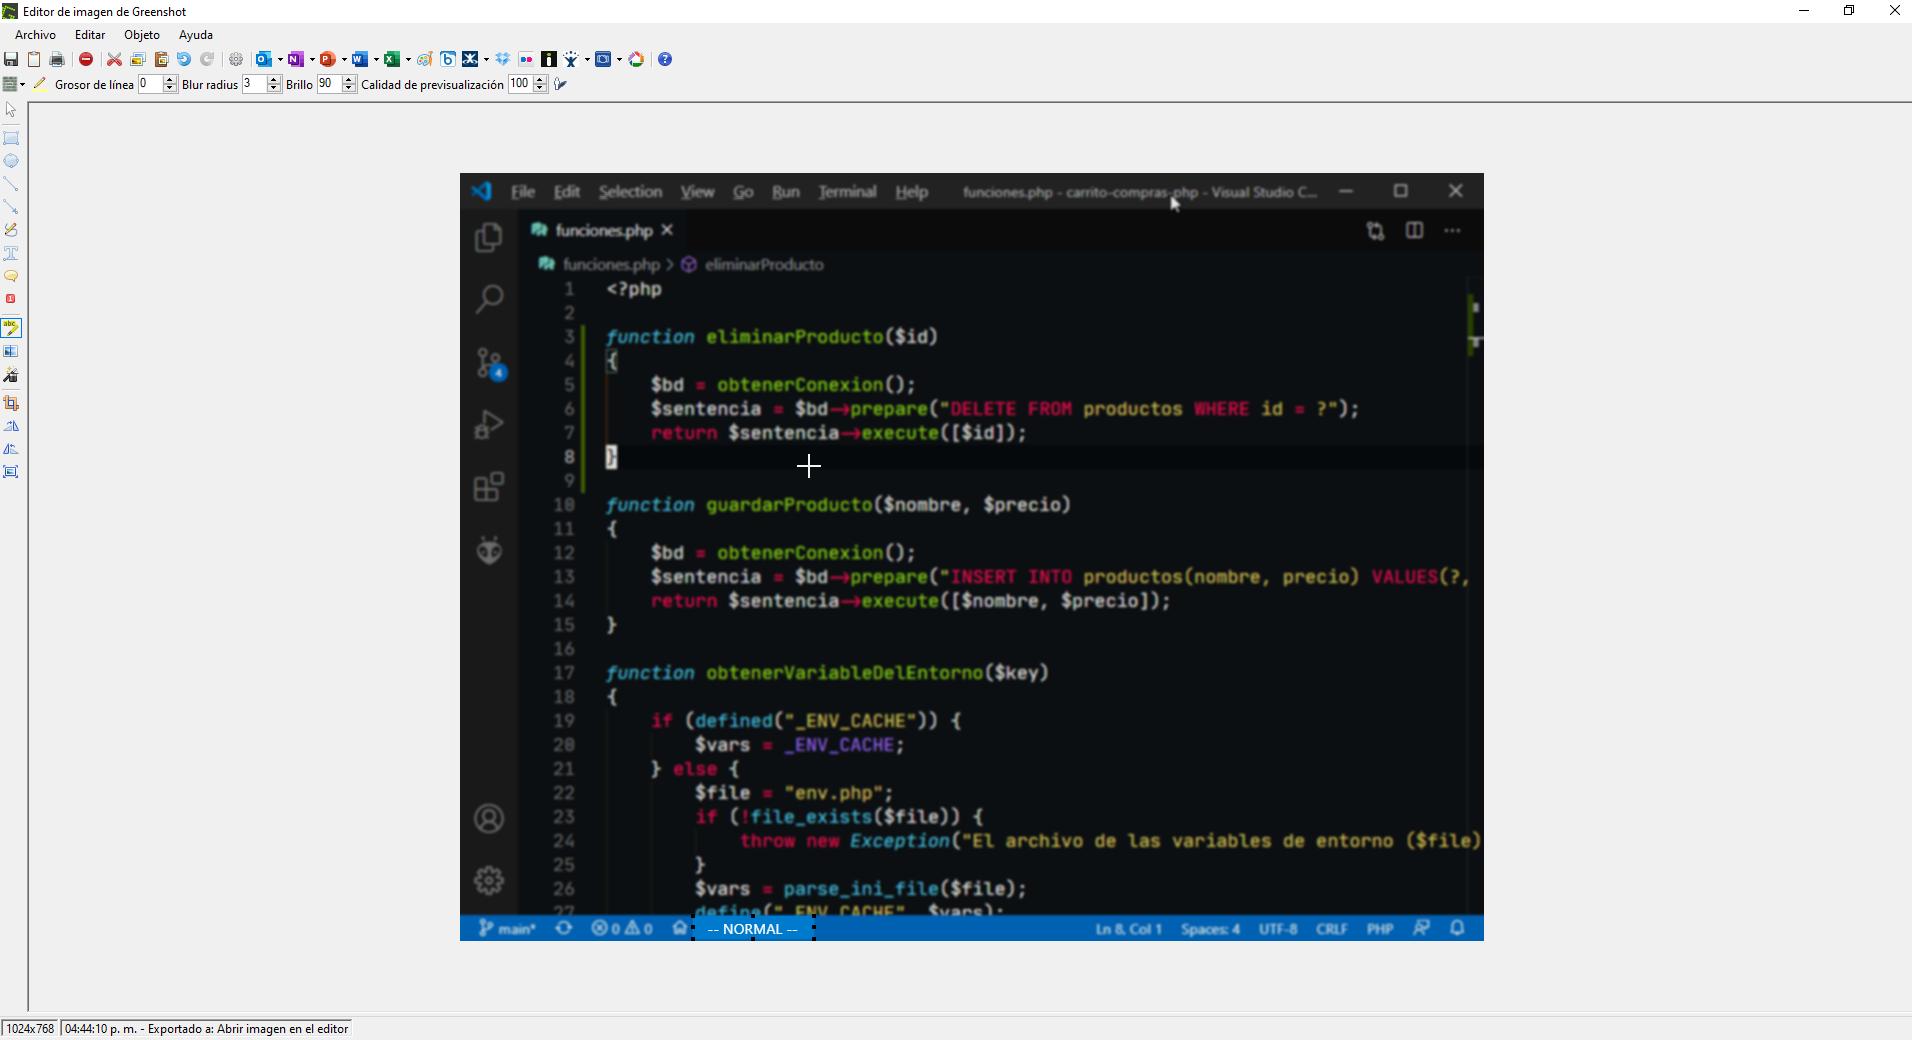 Greenshot - Herramienta para capturas de pantalla en Windows